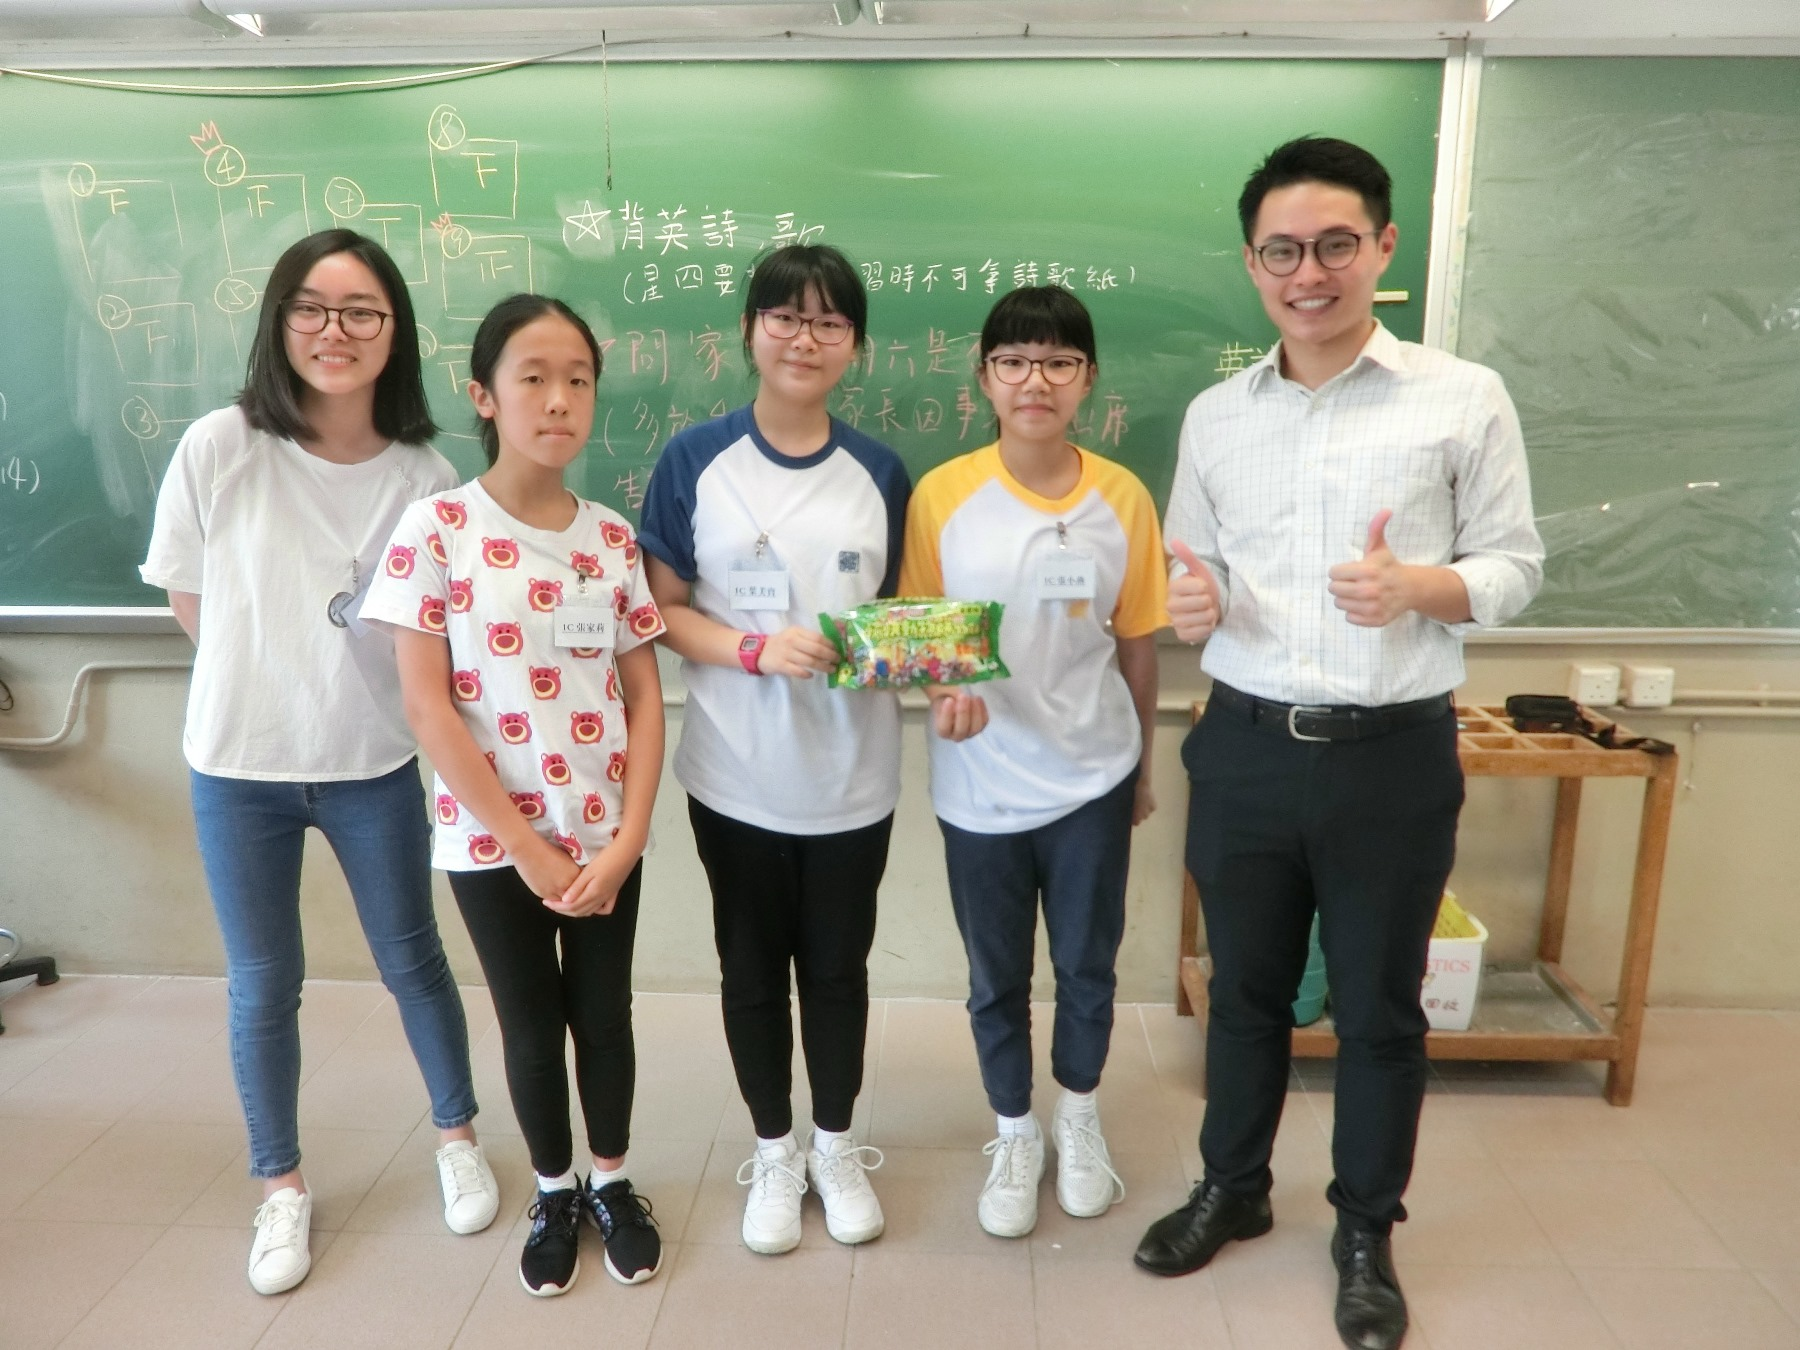 http://npc.edu.hk/sites/default/files/1c_dong_dong_nao_jin_da_bi_pin_05.jpg